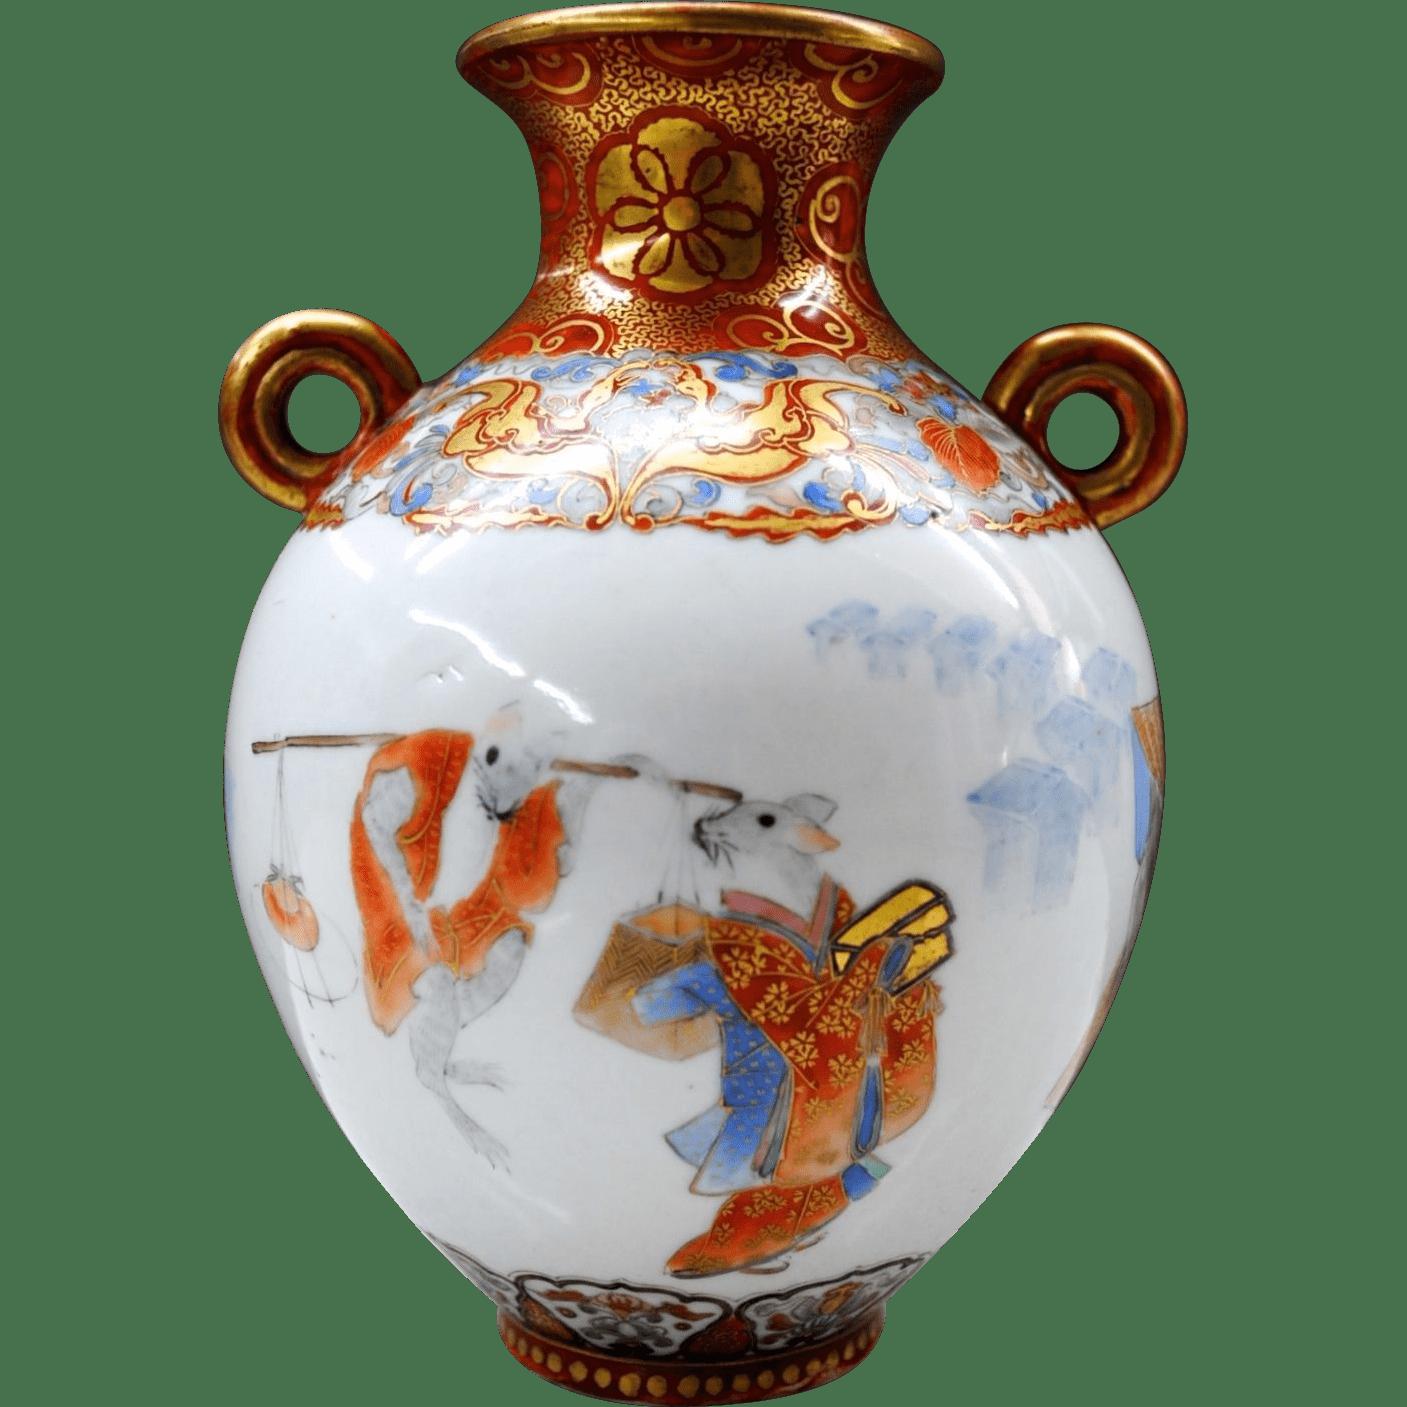 Vase png image purepng free transparent cc0 png image - Decoration de grand vase transparent ...